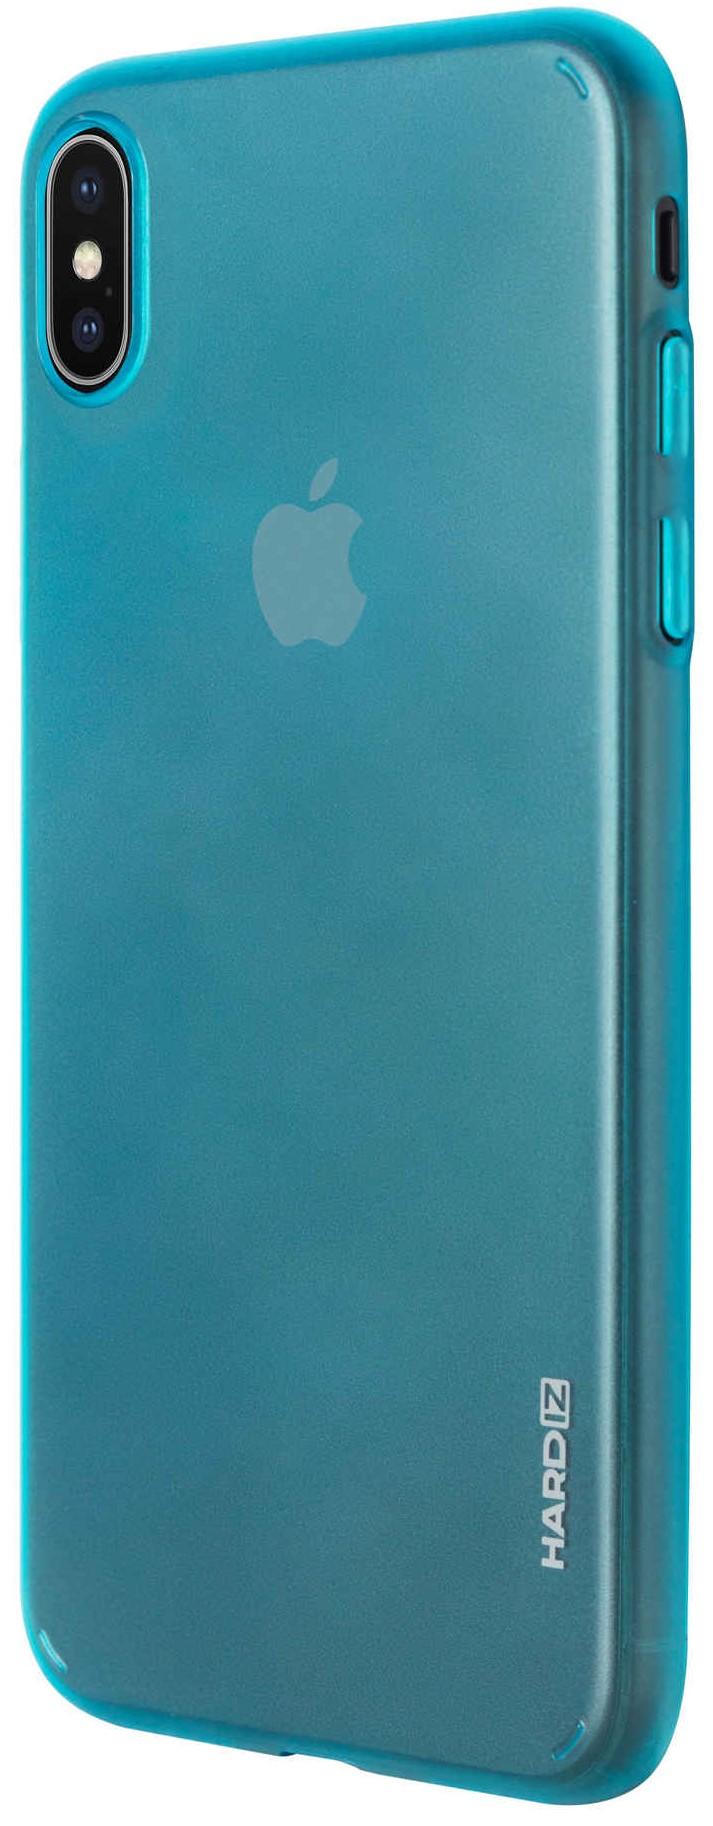 Клип-кейс Hardiz для Apple iPhone XS Max тонкий пластик LightBlue клип кейс uniq apple iphone xs max тонкий пластик позрачный